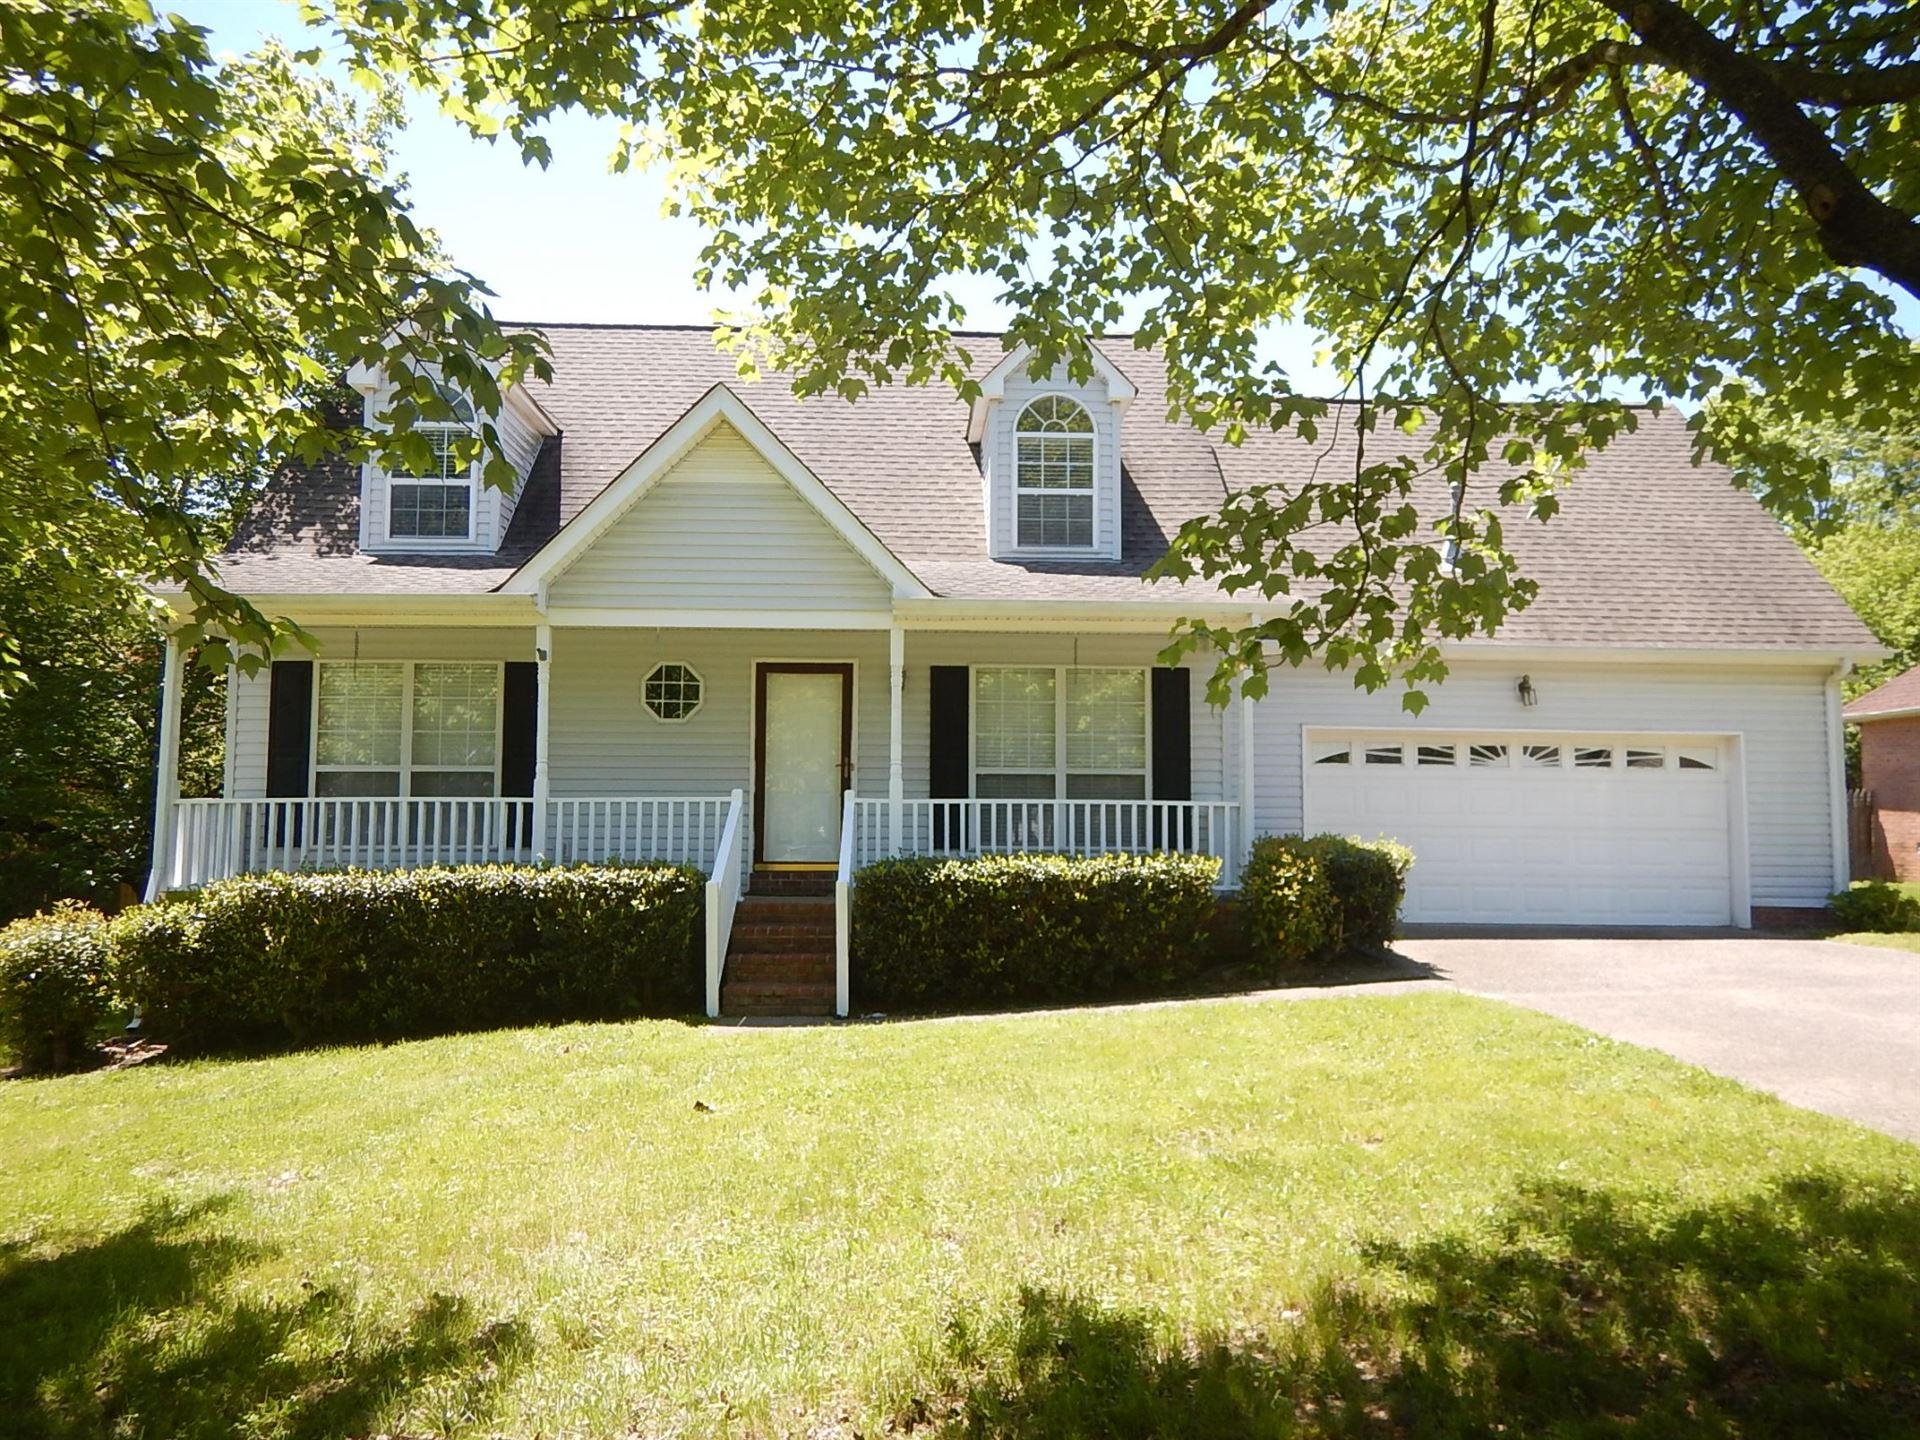 158 Buckingham Blvd, Gallatin, TN 37066 - MLS#: 2252915